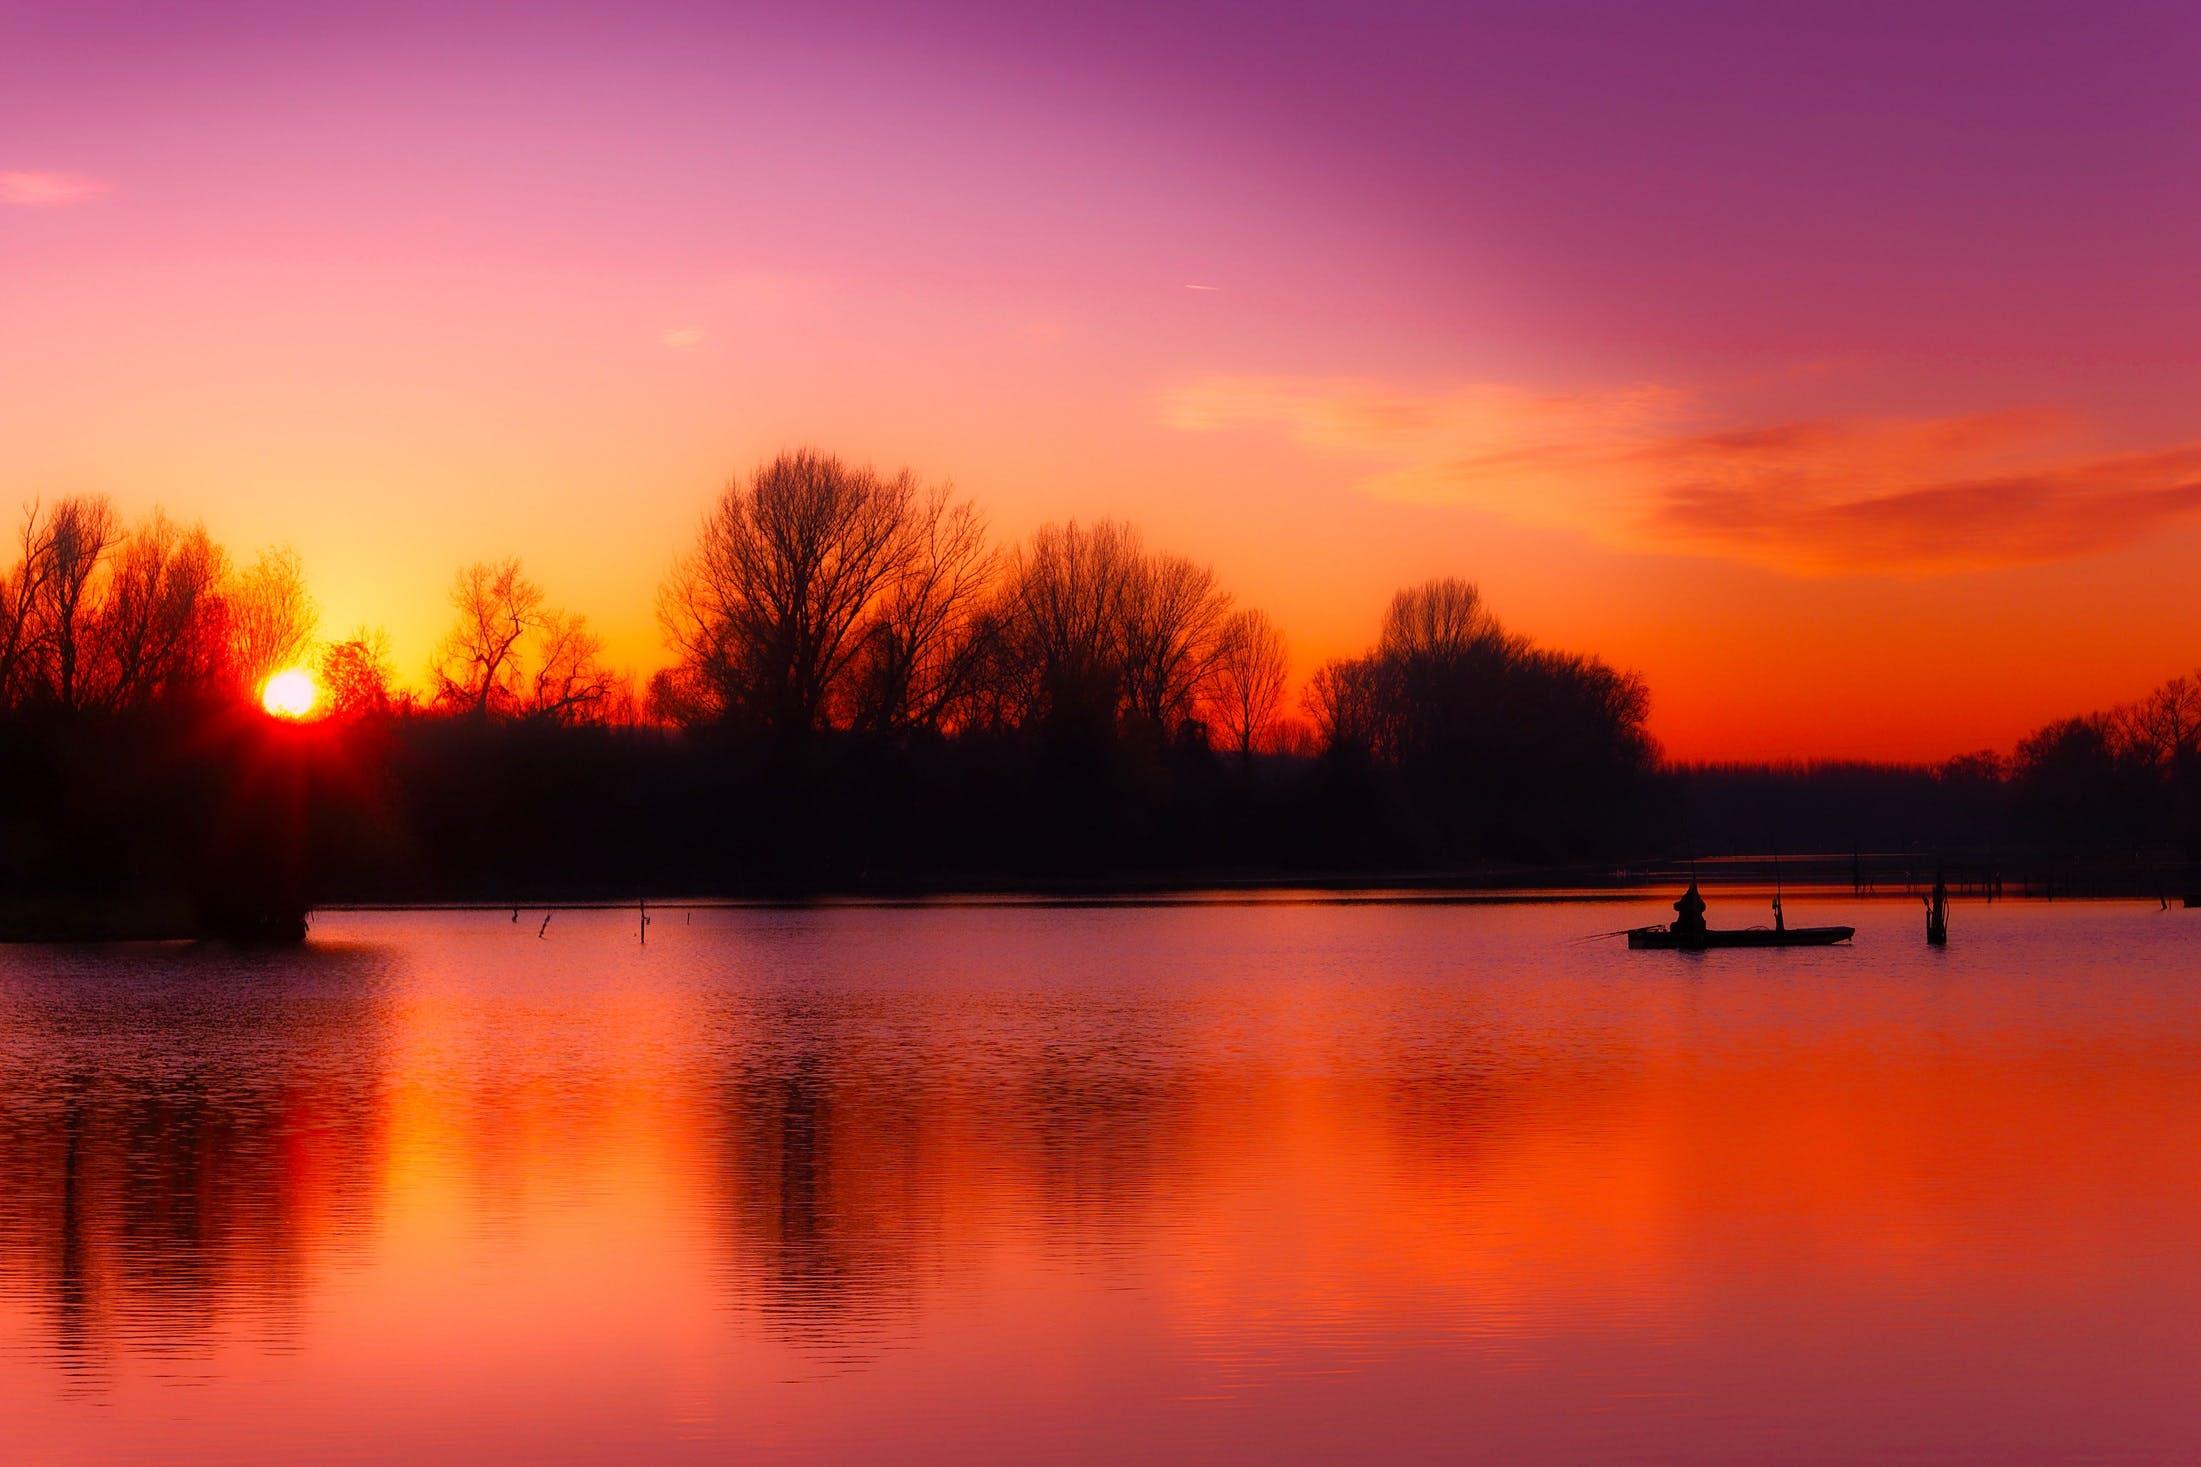 Gratis stockfoto met avond, bomen, boot, Bos